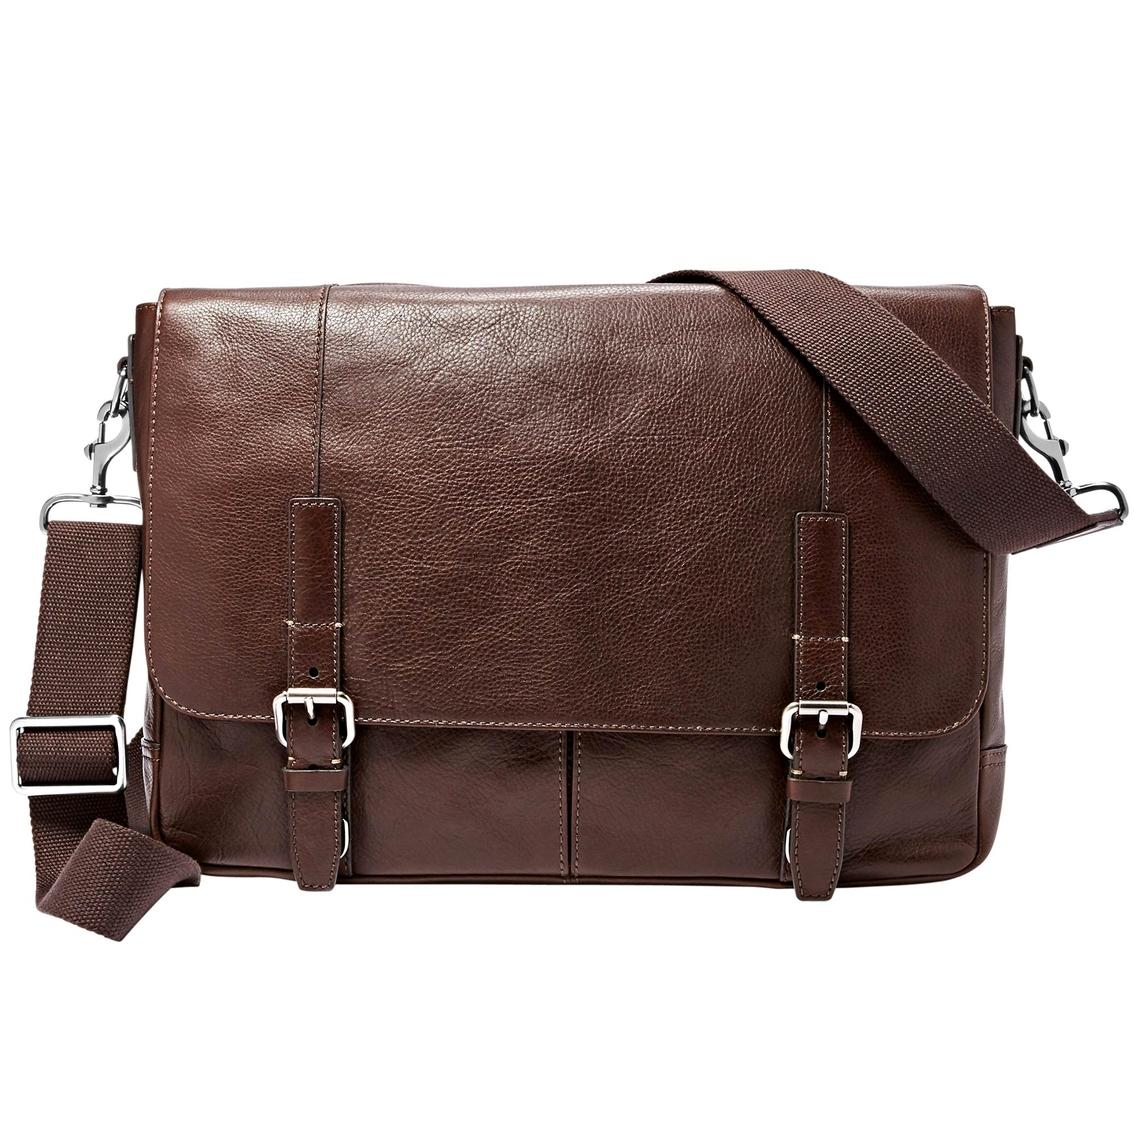 Fossil Graham East West Messenger Bag   Business Cases   More   Shop The Exchange